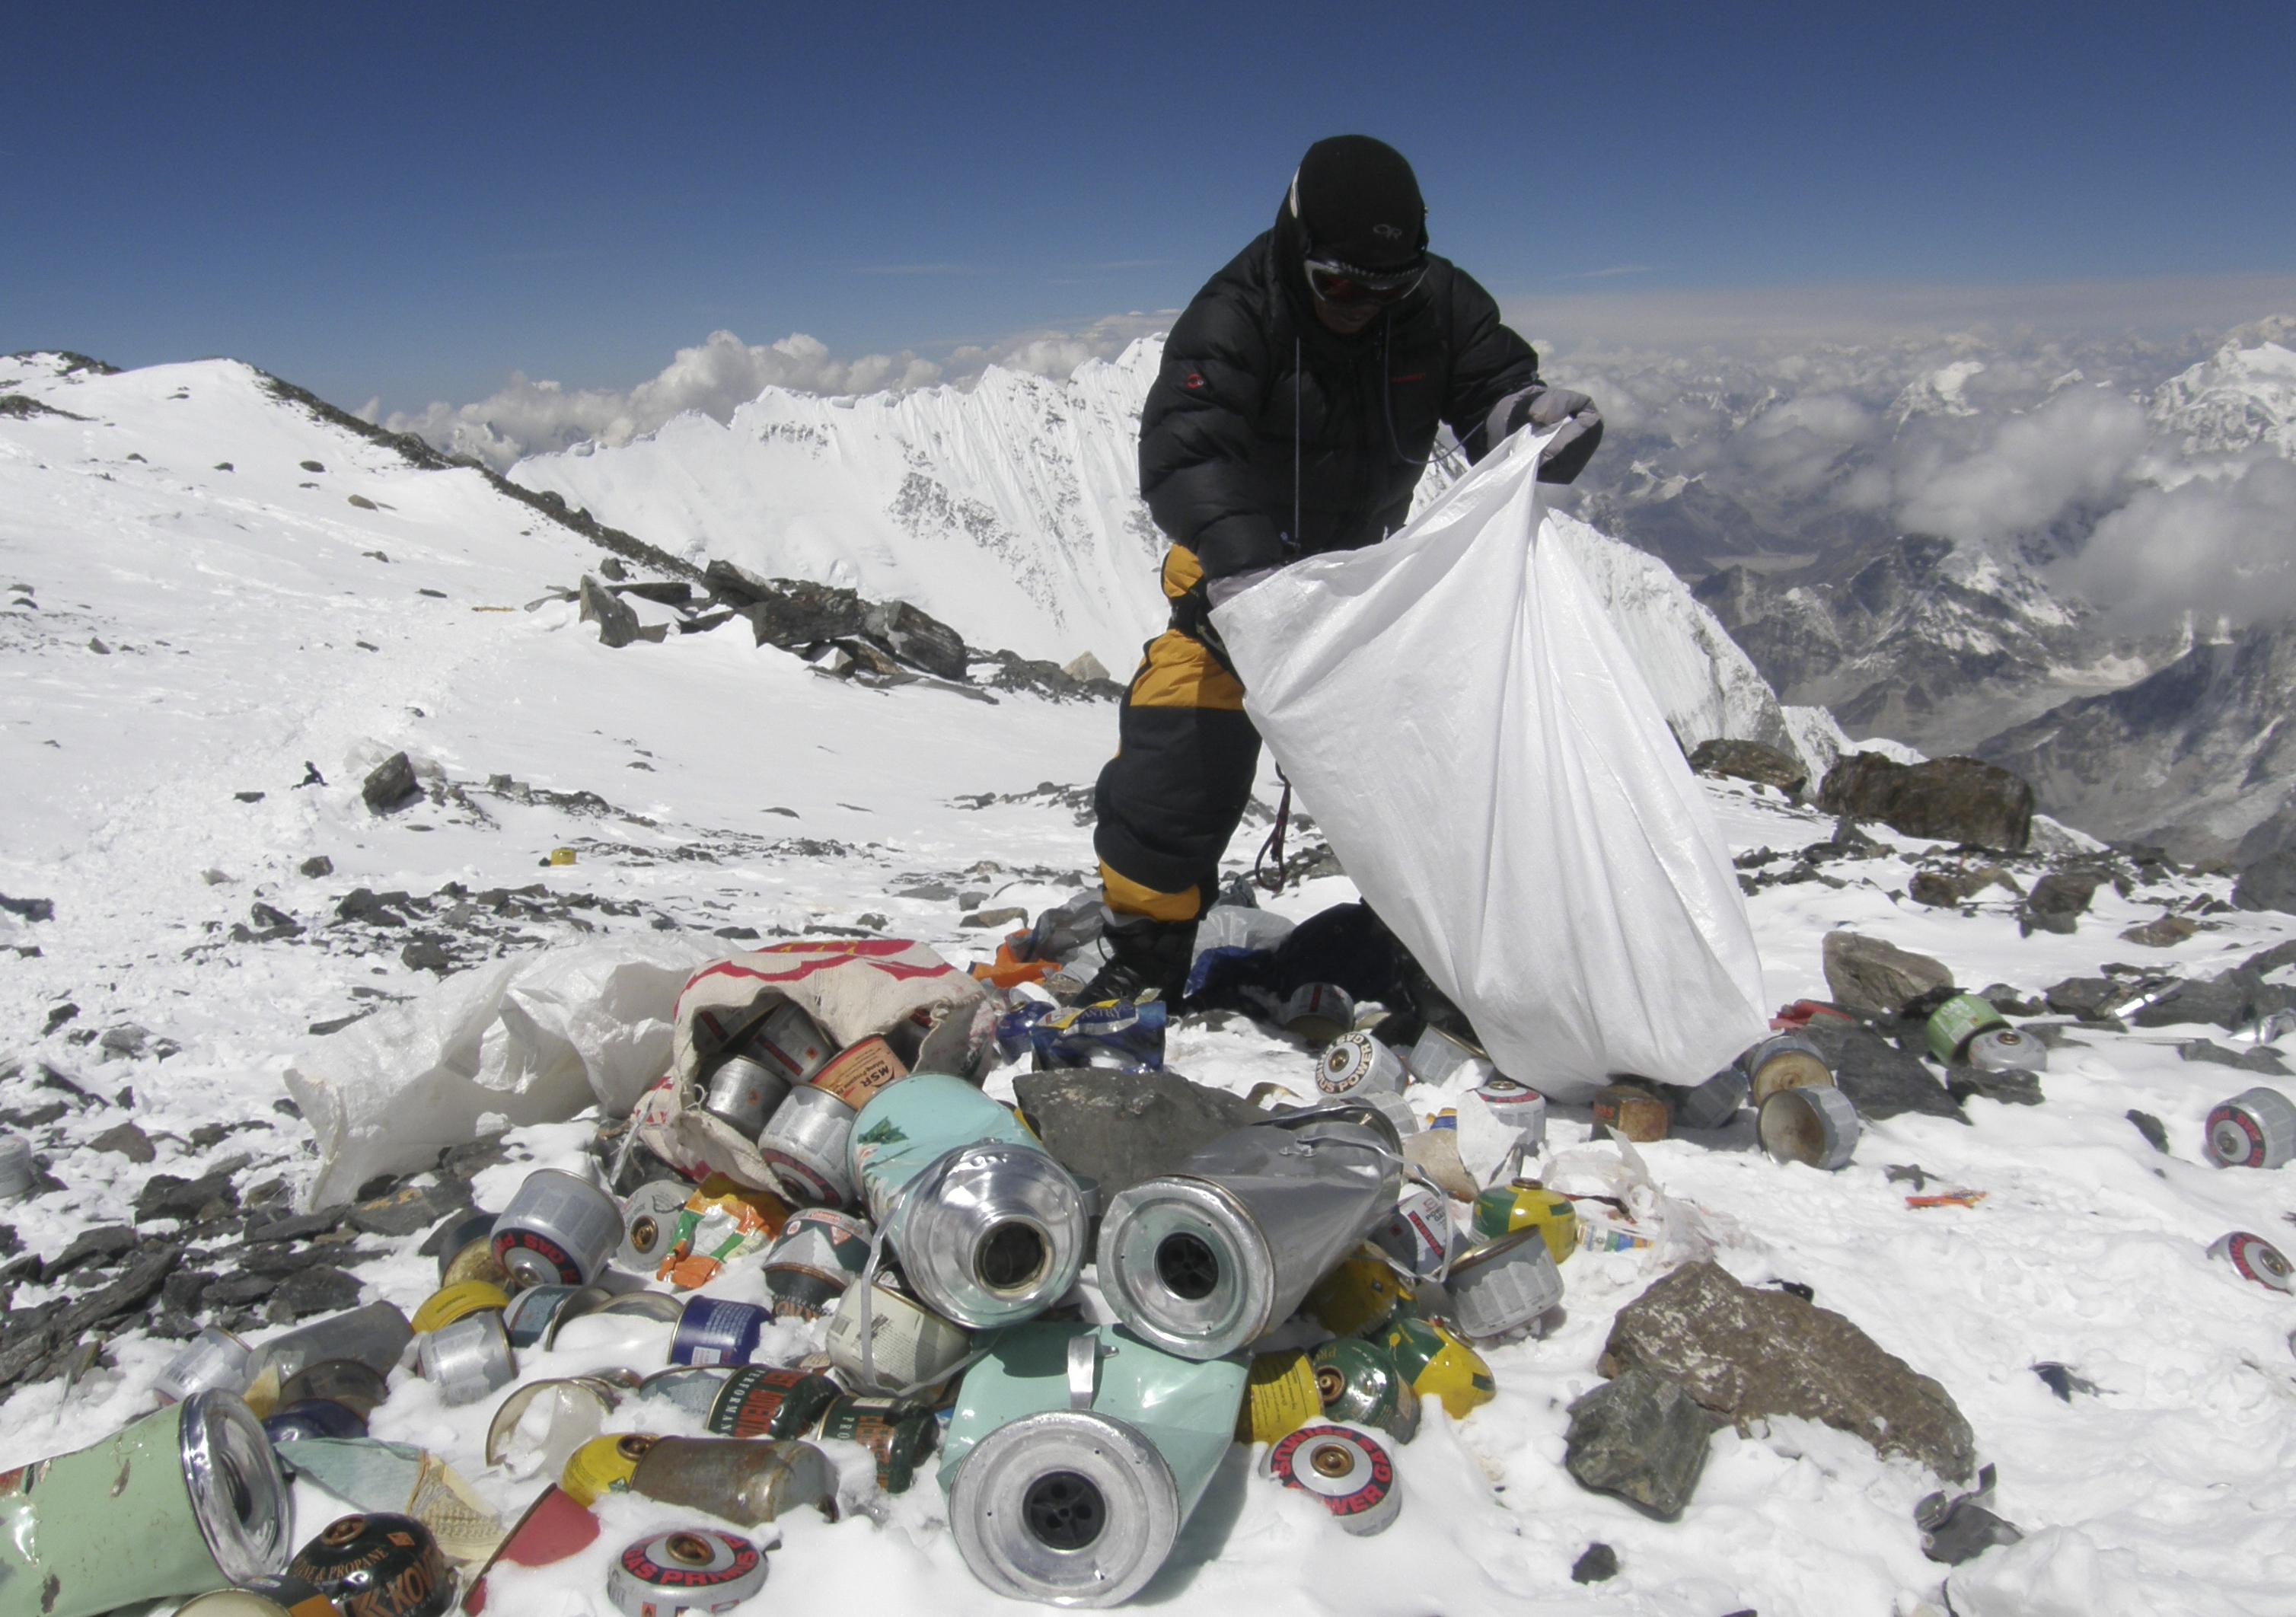 Kína kitiltotta a turistákat Mount Everesten lévő alaptáborból